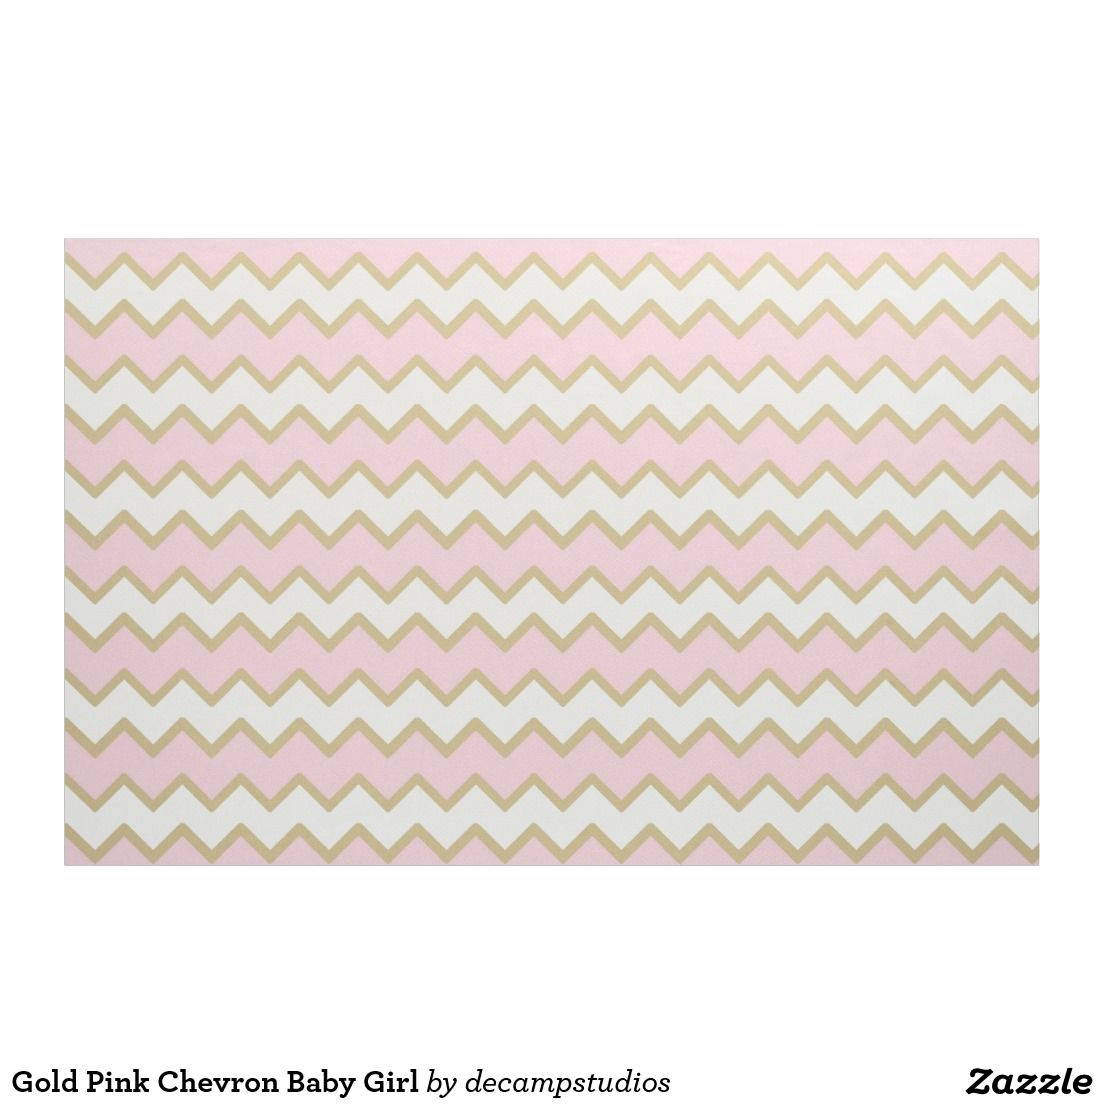 Gold Pink Chevron Baby Girl Fabric